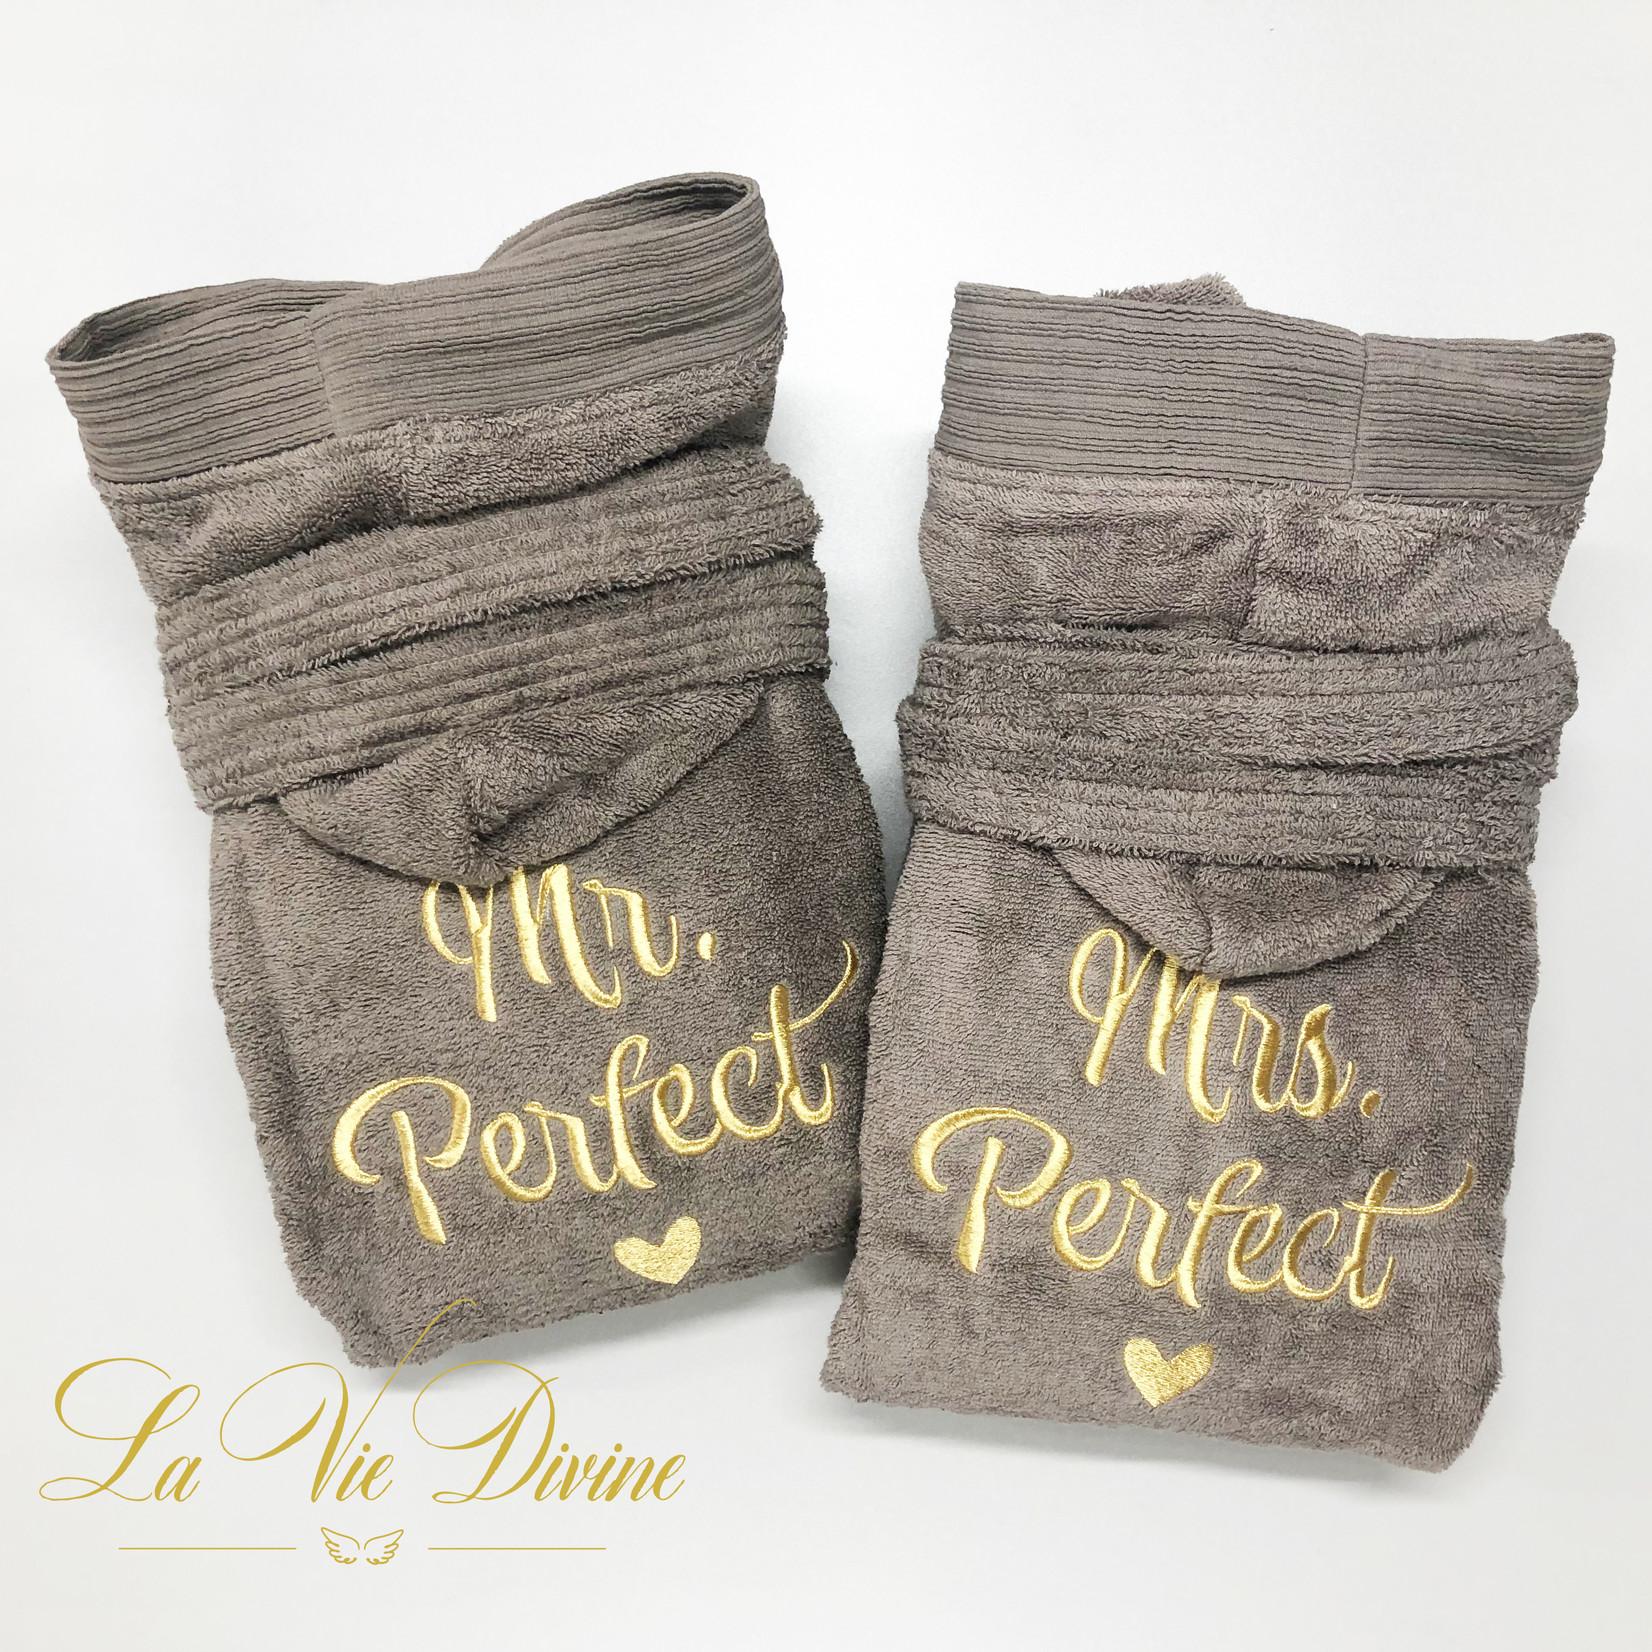 The One towelling Badjassenset Mr. & Mrs. Perfect